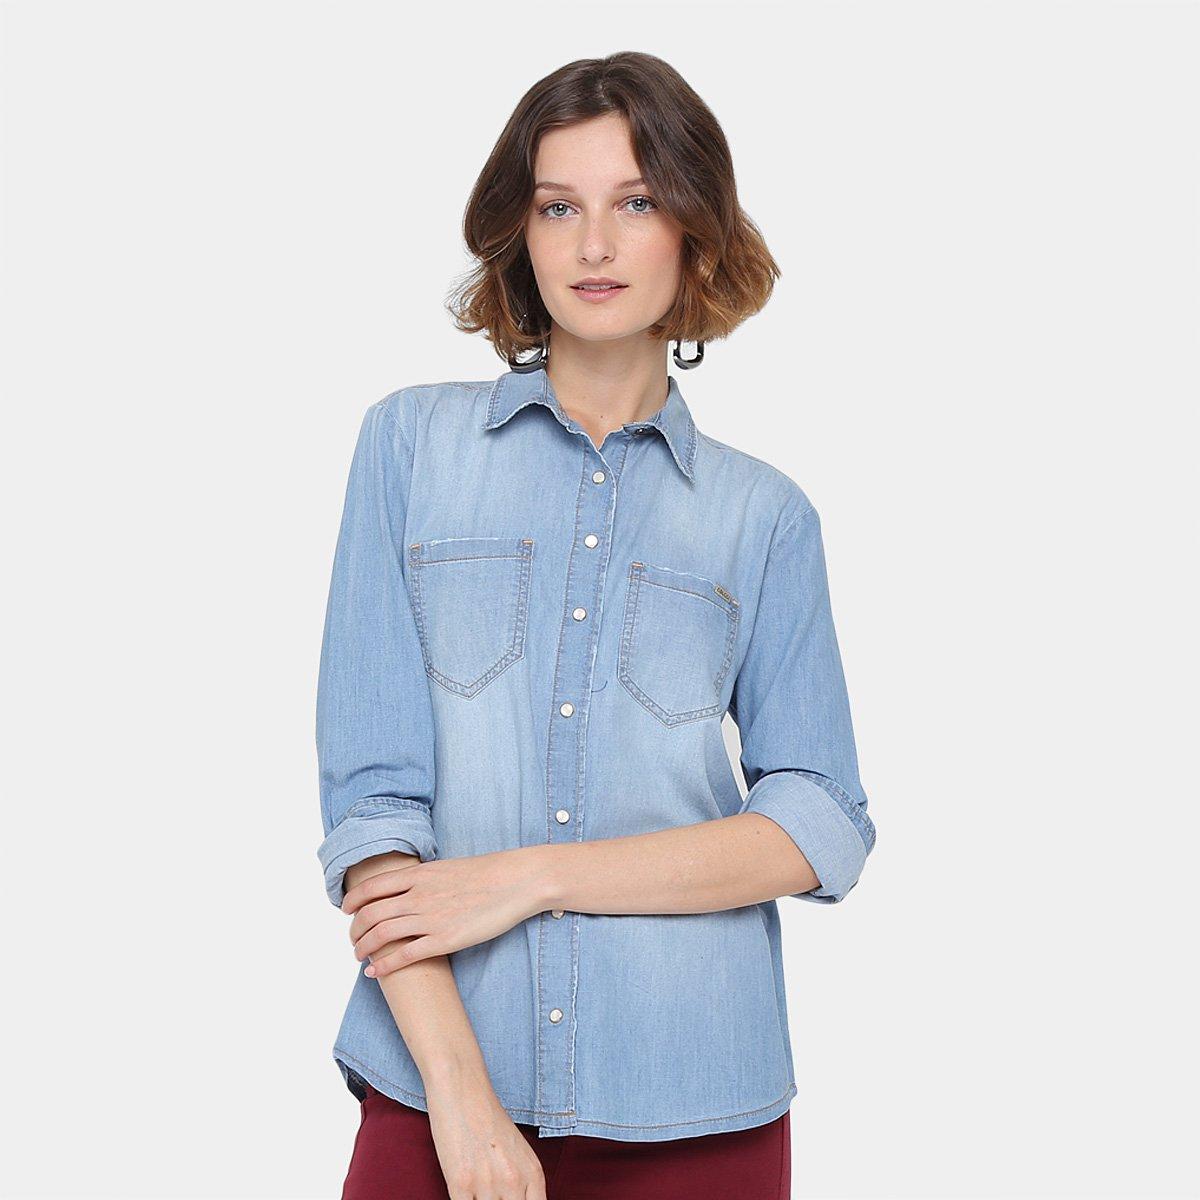 a3509a14d Camisa Jeans Colcci Manga Longa Feminina | Zattini